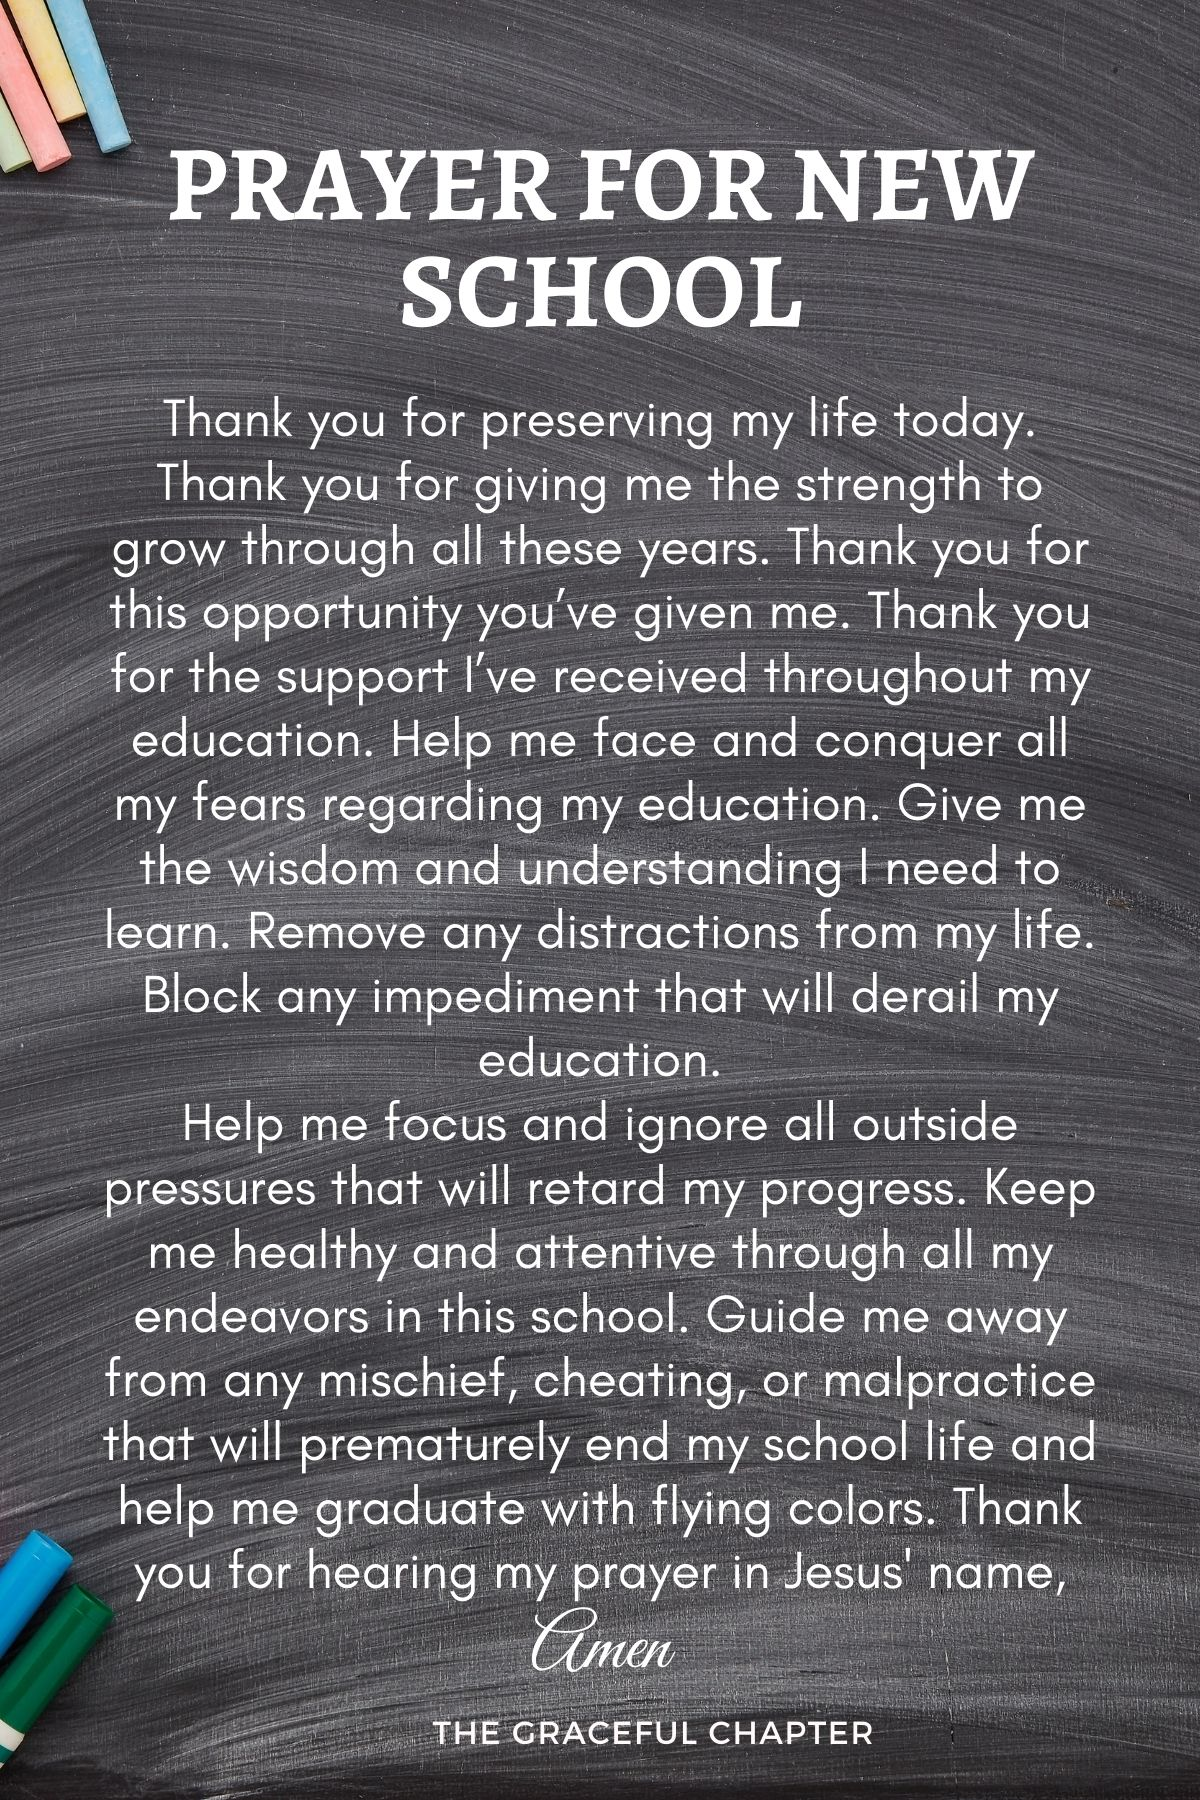 Prayer for new school